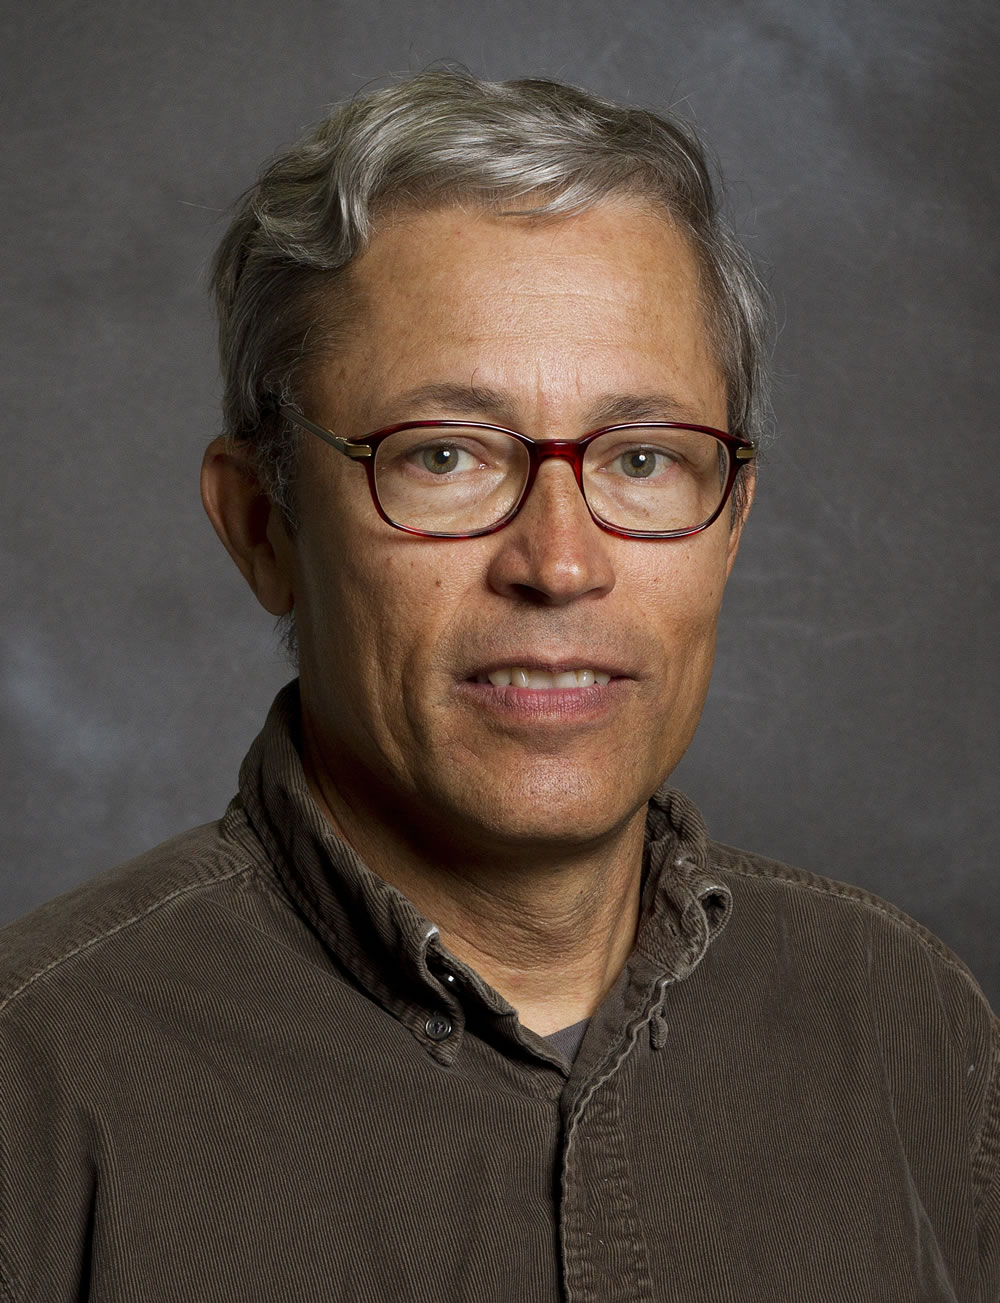 Greg Lyzenga